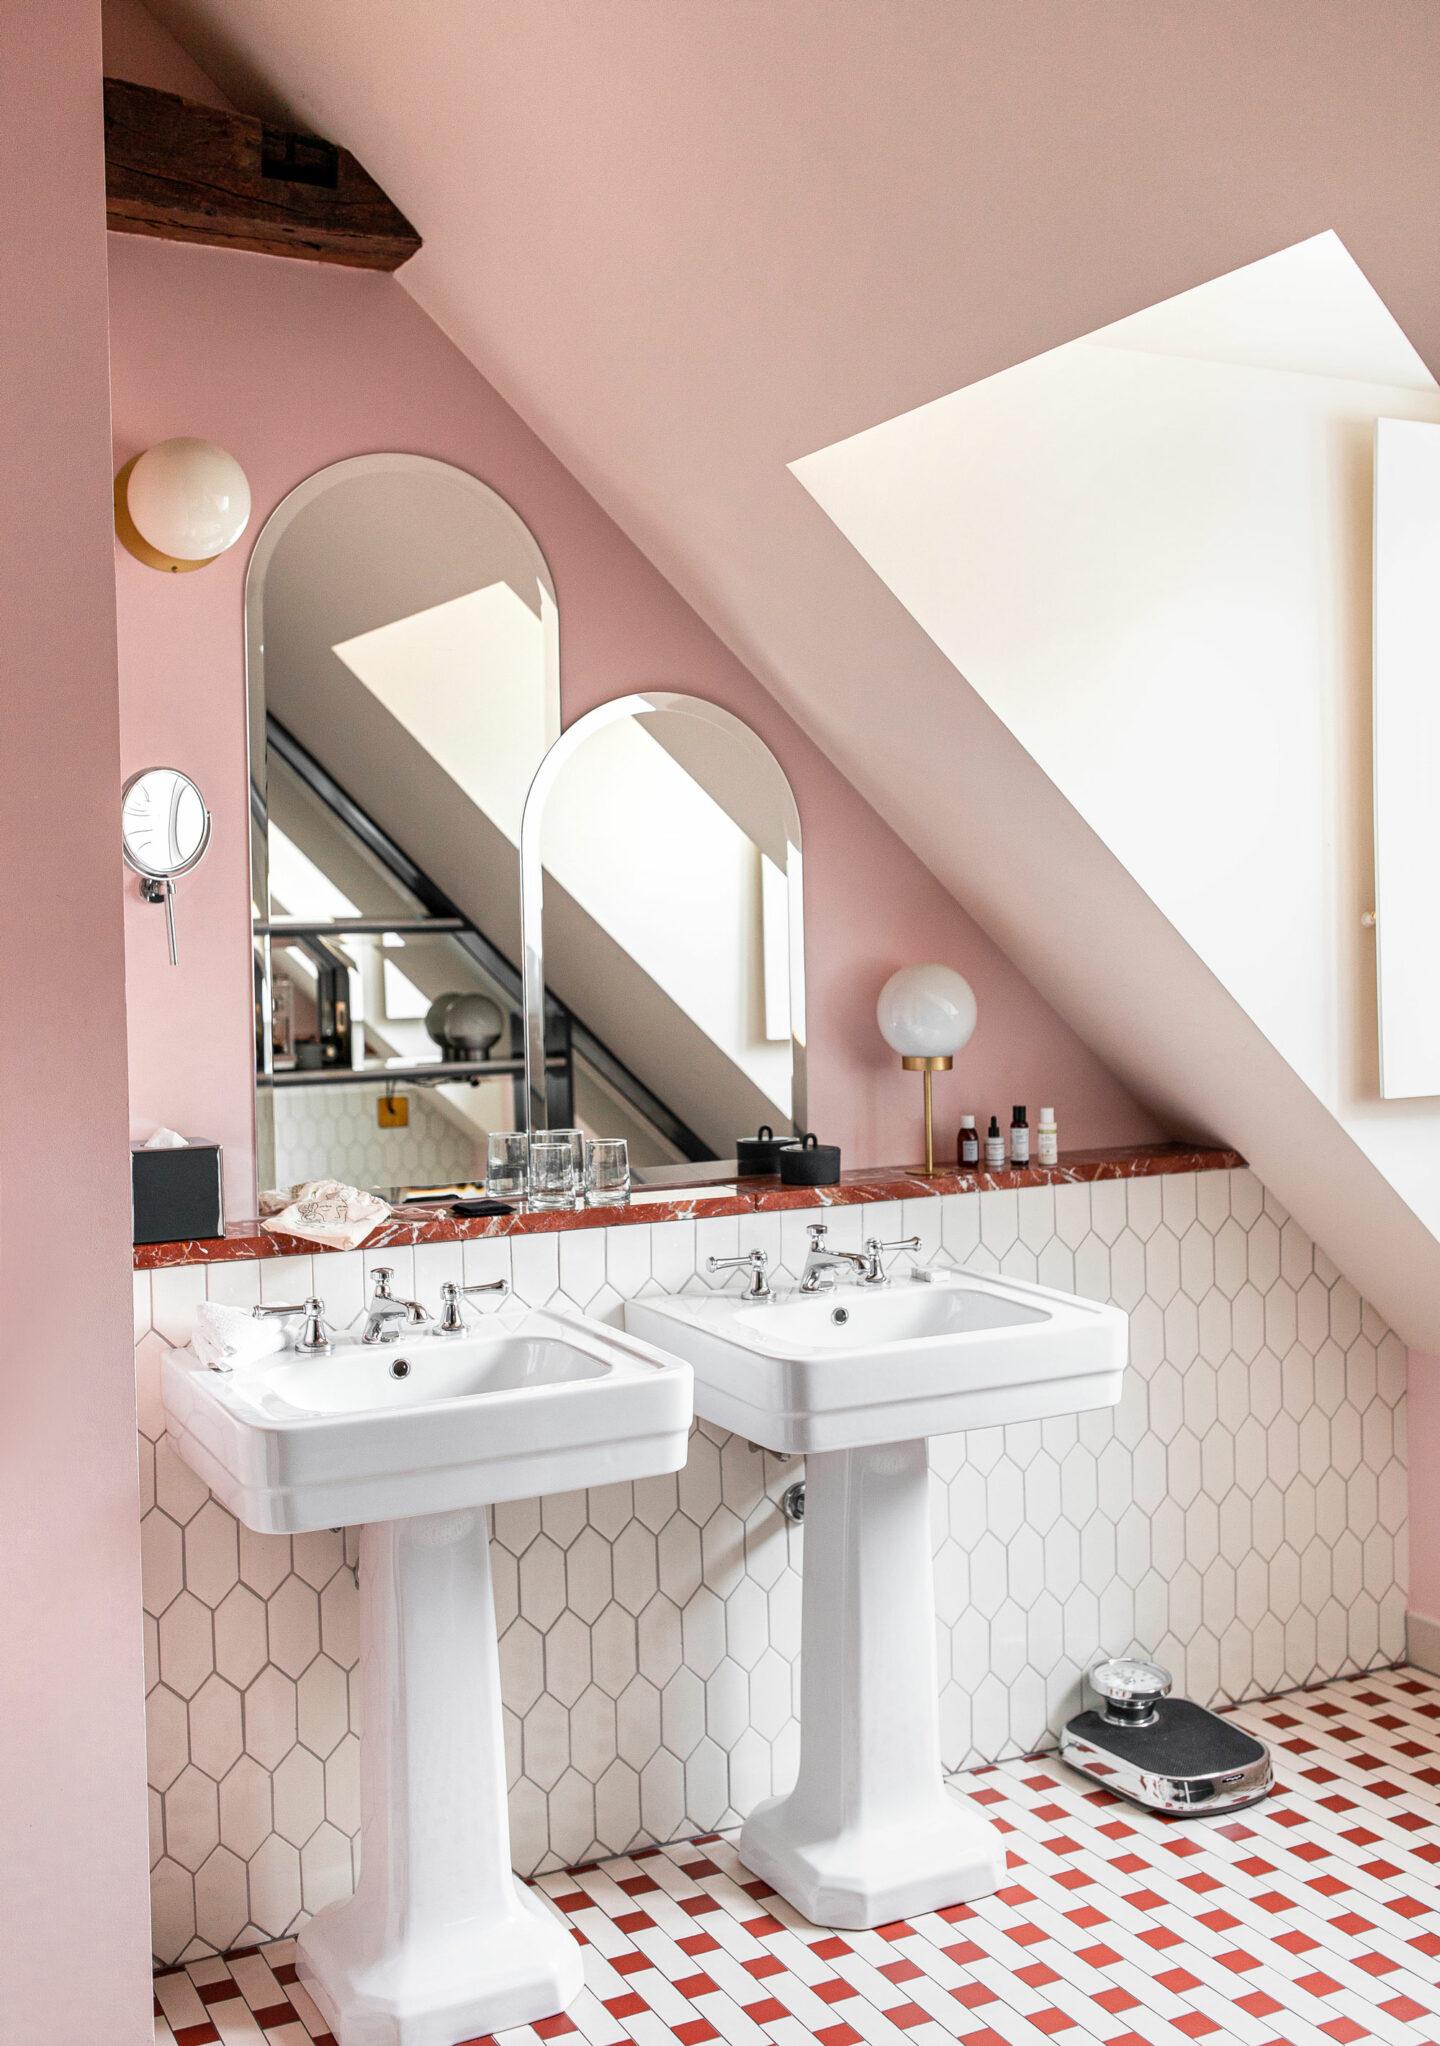 3-best-hotels-in-paris-where-to-stay-in-paris-paris-boutique-hotel-Hotel-des-Grands-Boulevards-kelsey-heinrichs-kelseyinlondon-1